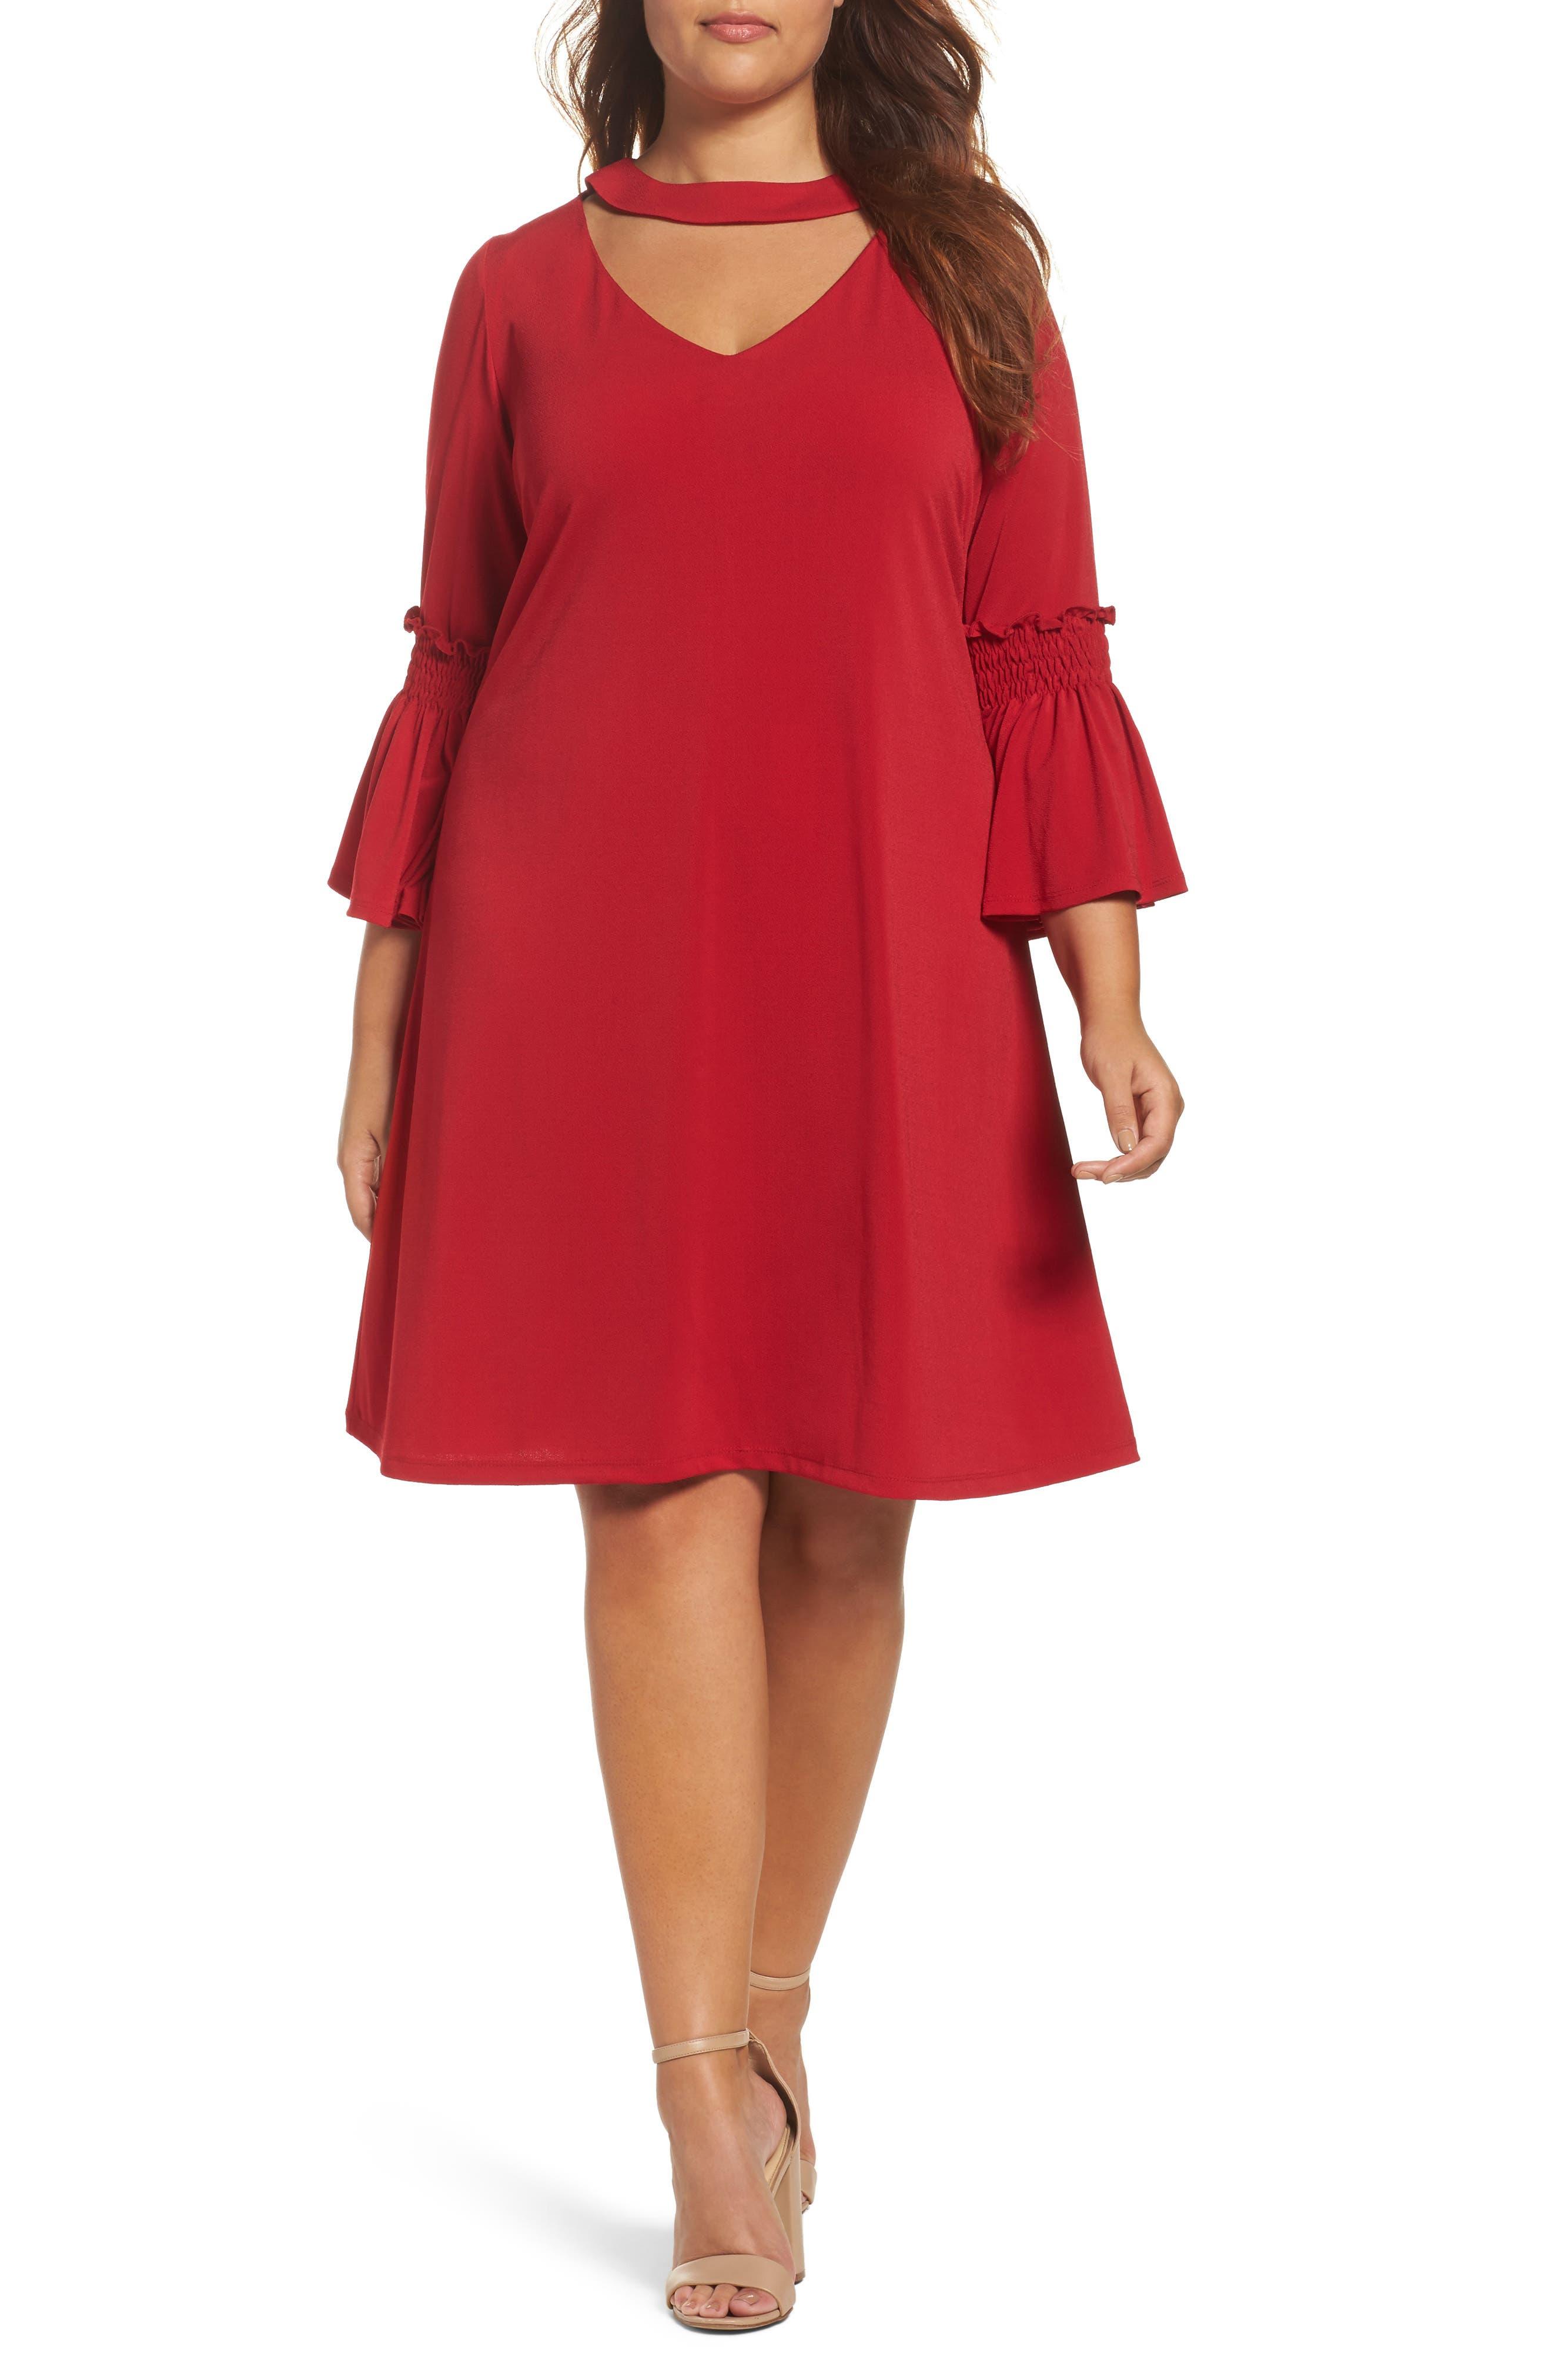 Alternate Image 1 Selected - Gabby Skye Bell Sleeve A-Line Choker Dress (Plus Size)